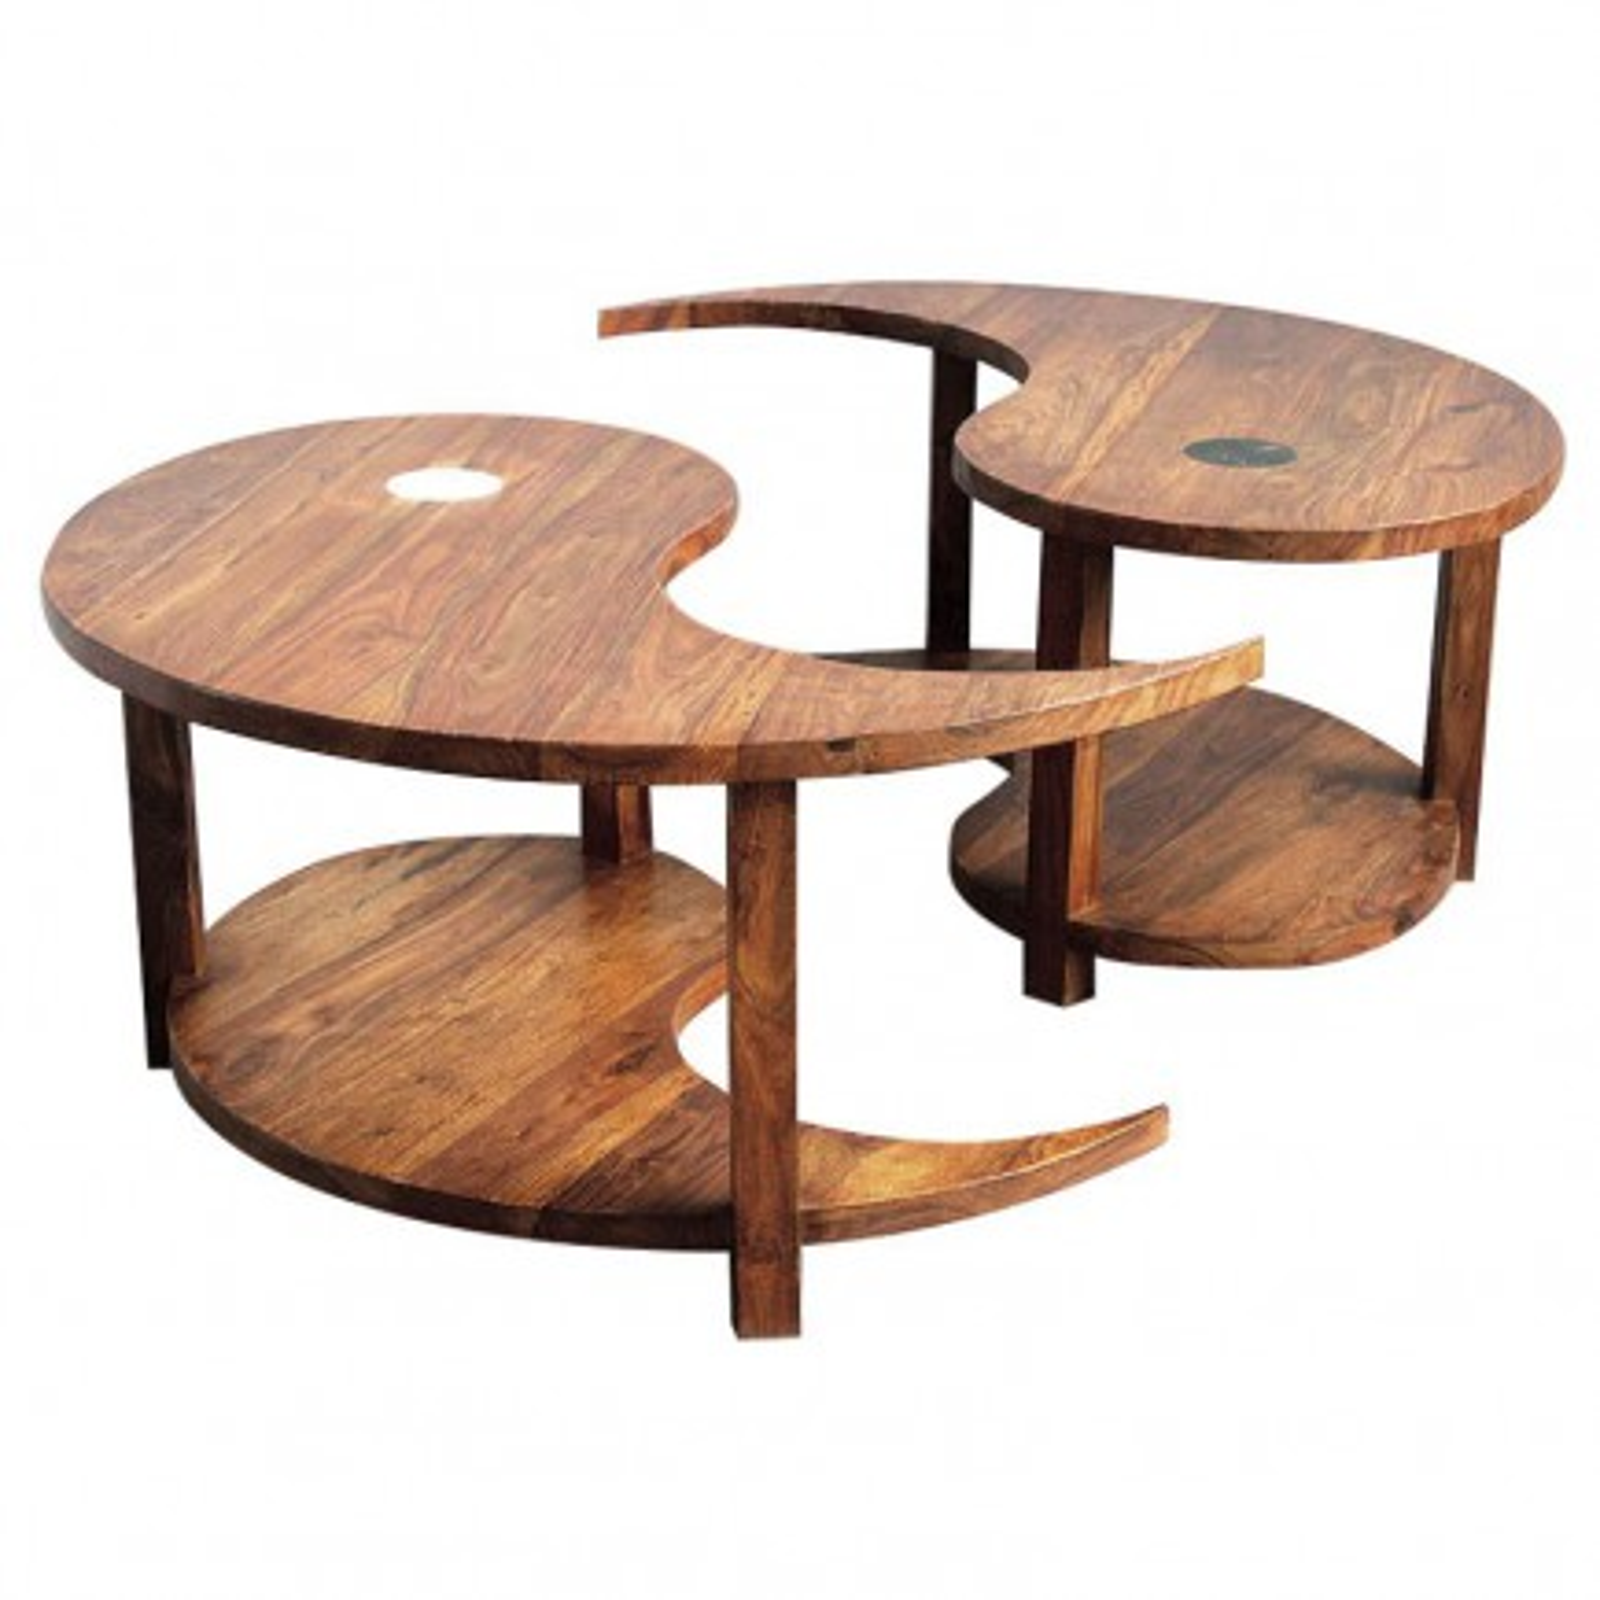 Table basse yin yang d coration chinoise - Table basse ying yang ...